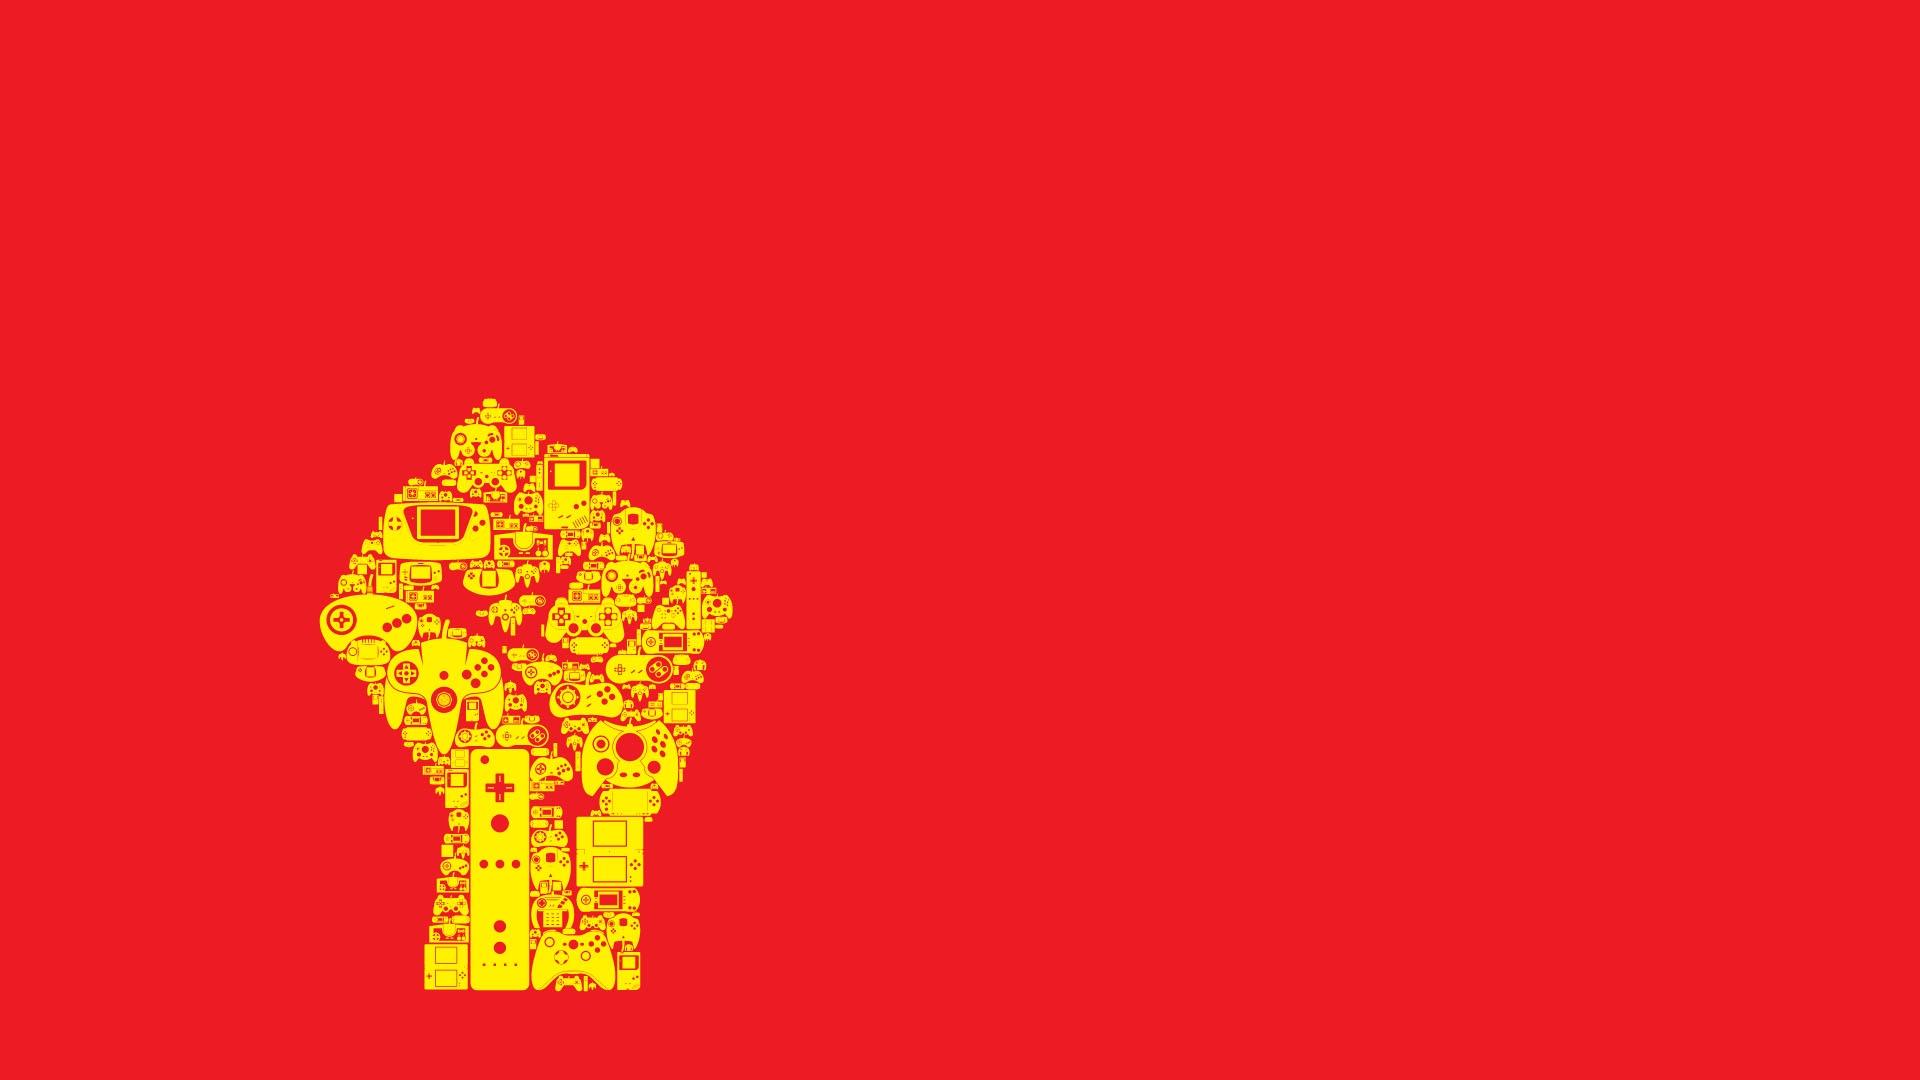 Left Wing Socialism   HD Wallpapers Widescreen   1920x1080 1920x1080